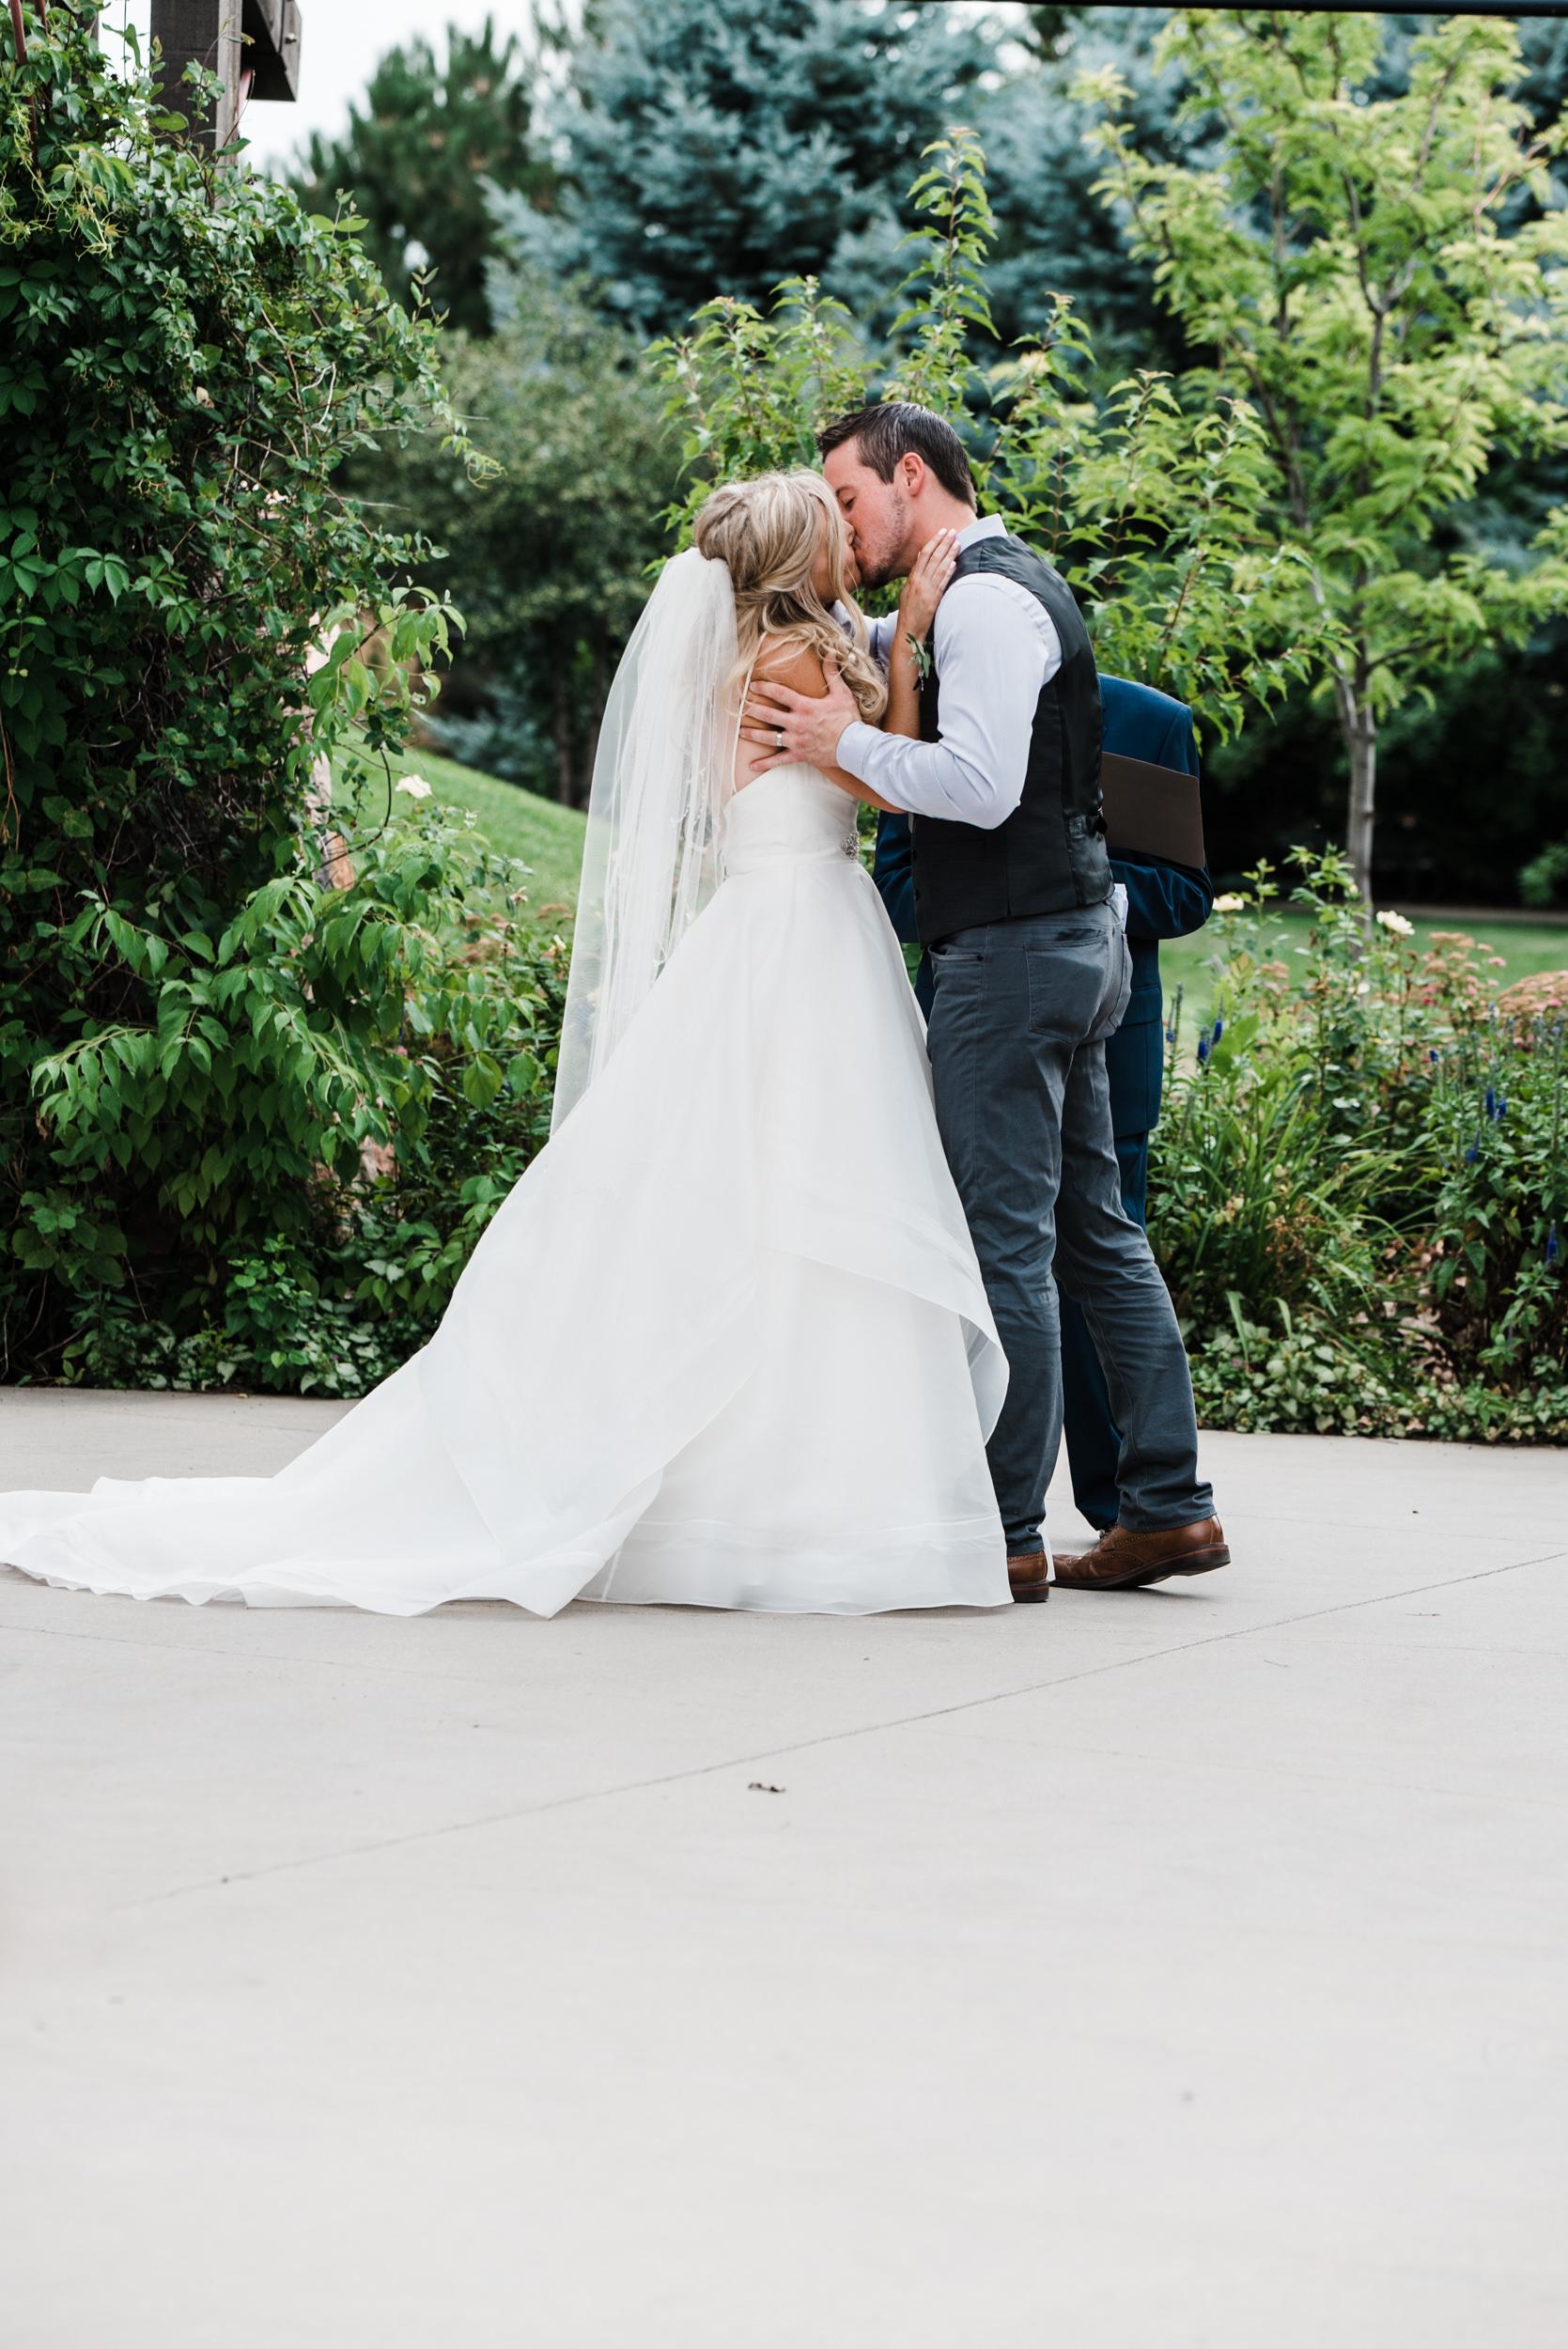 Colorado mountain wedding photographer at Brookeside Gardens wedding ceremony first kiss